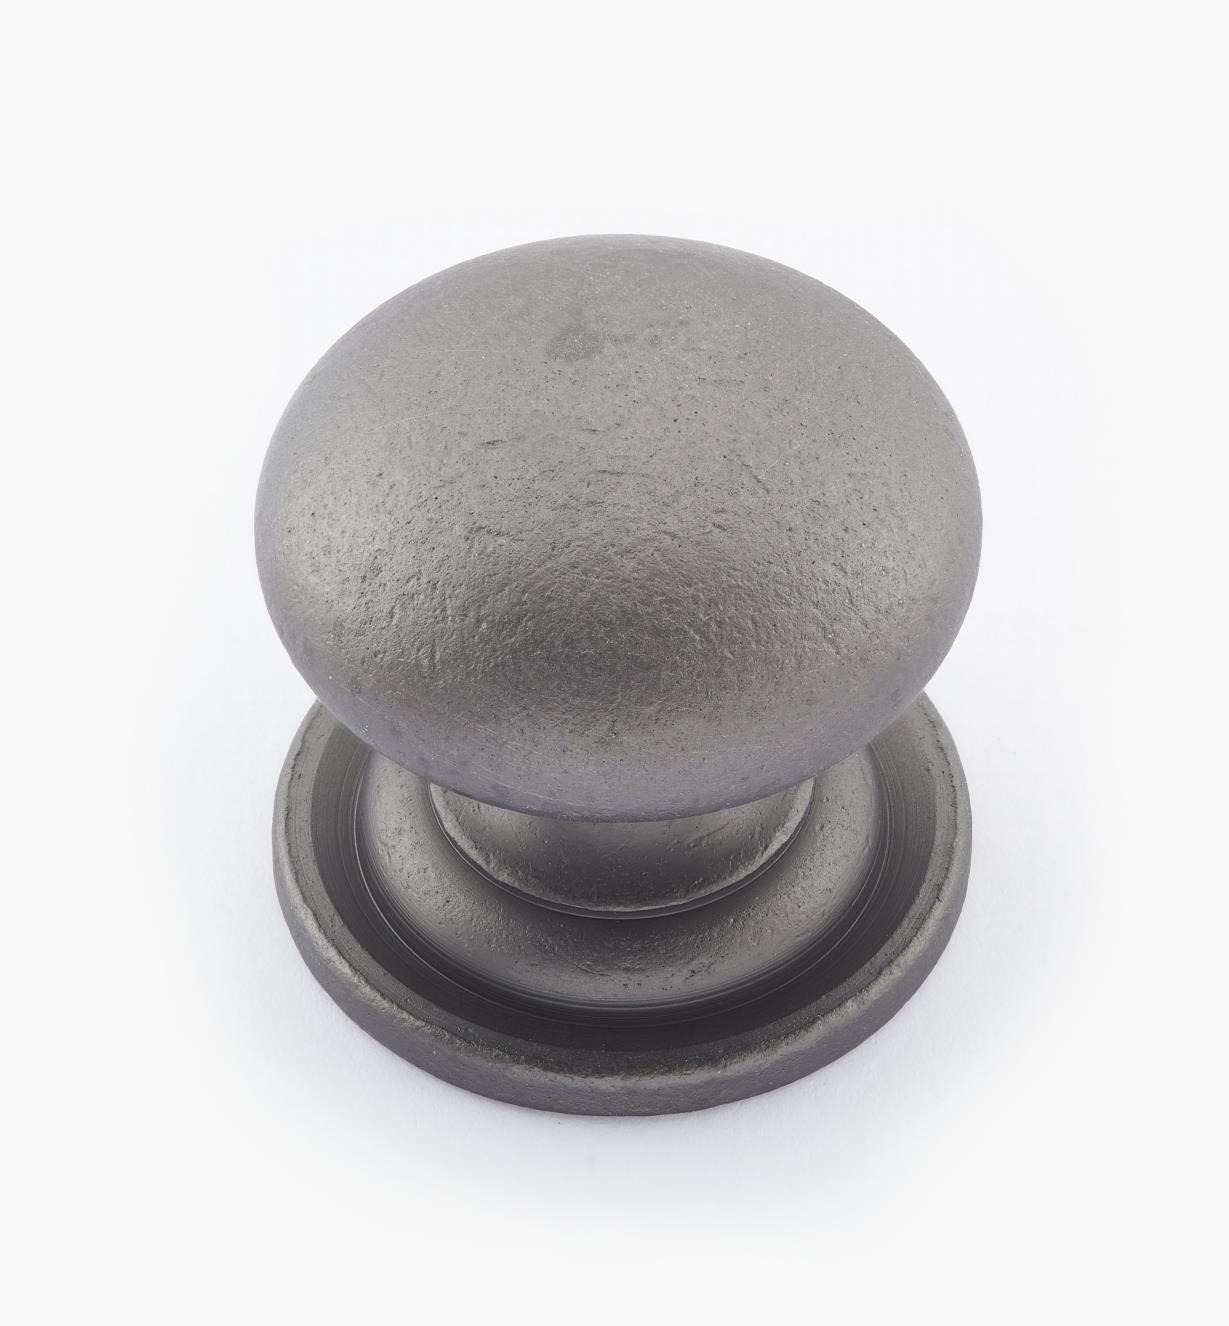 "02W1563 - 1 3/8"" × 1 1/4"" Round Brass Knob, Pewter"